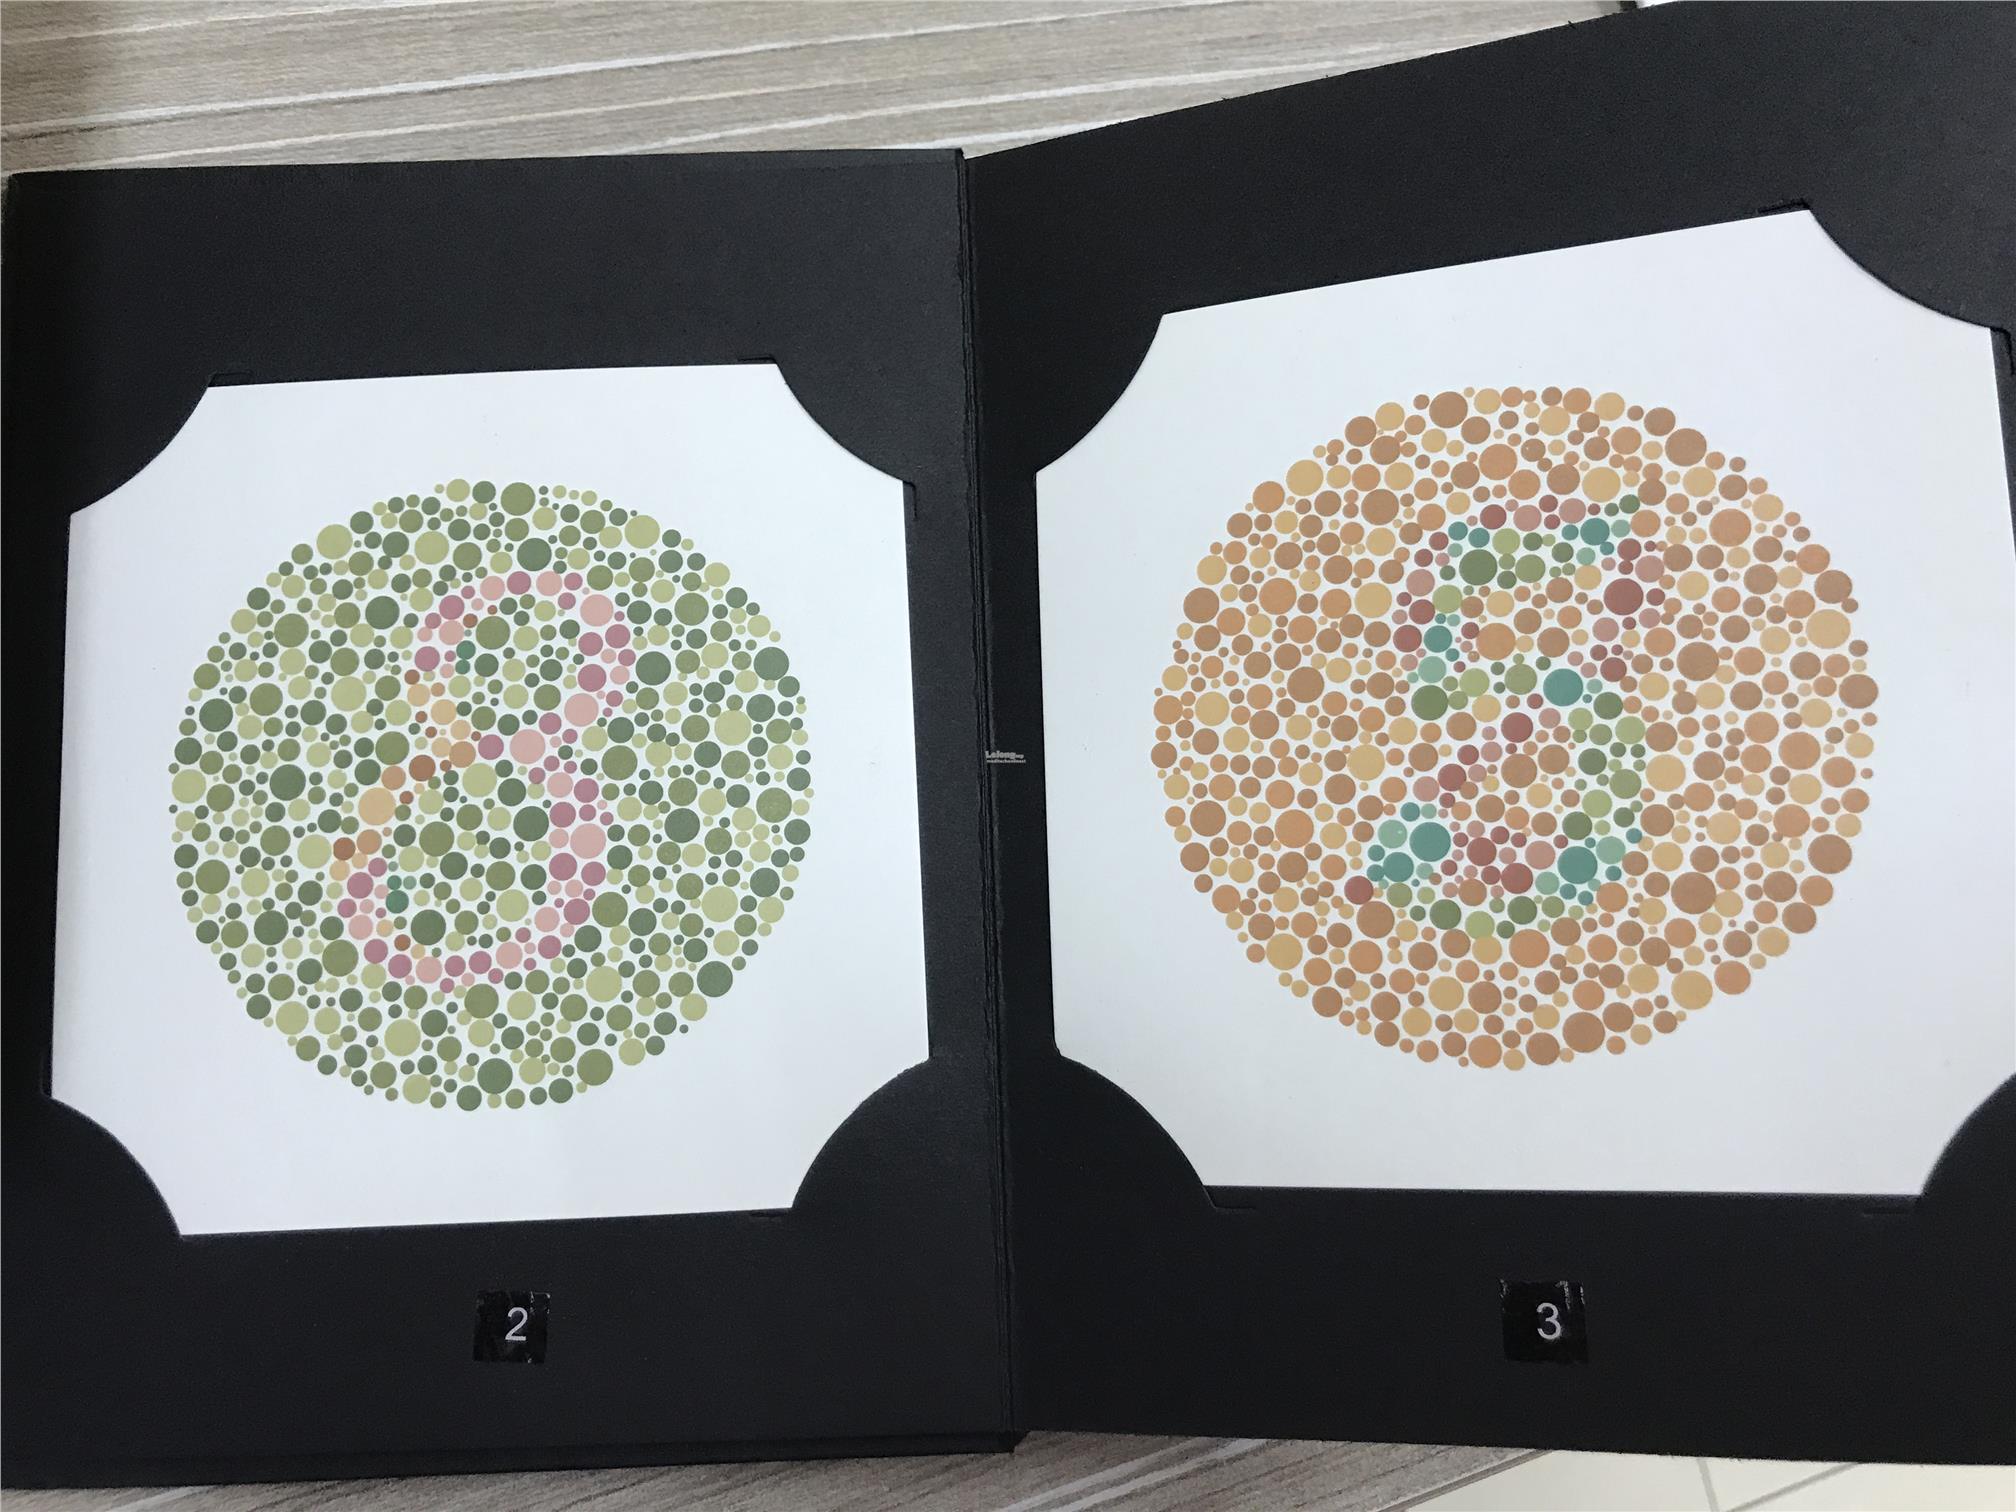 Ishihara Color Blindness Chart Siz End 6222019 104 Pm